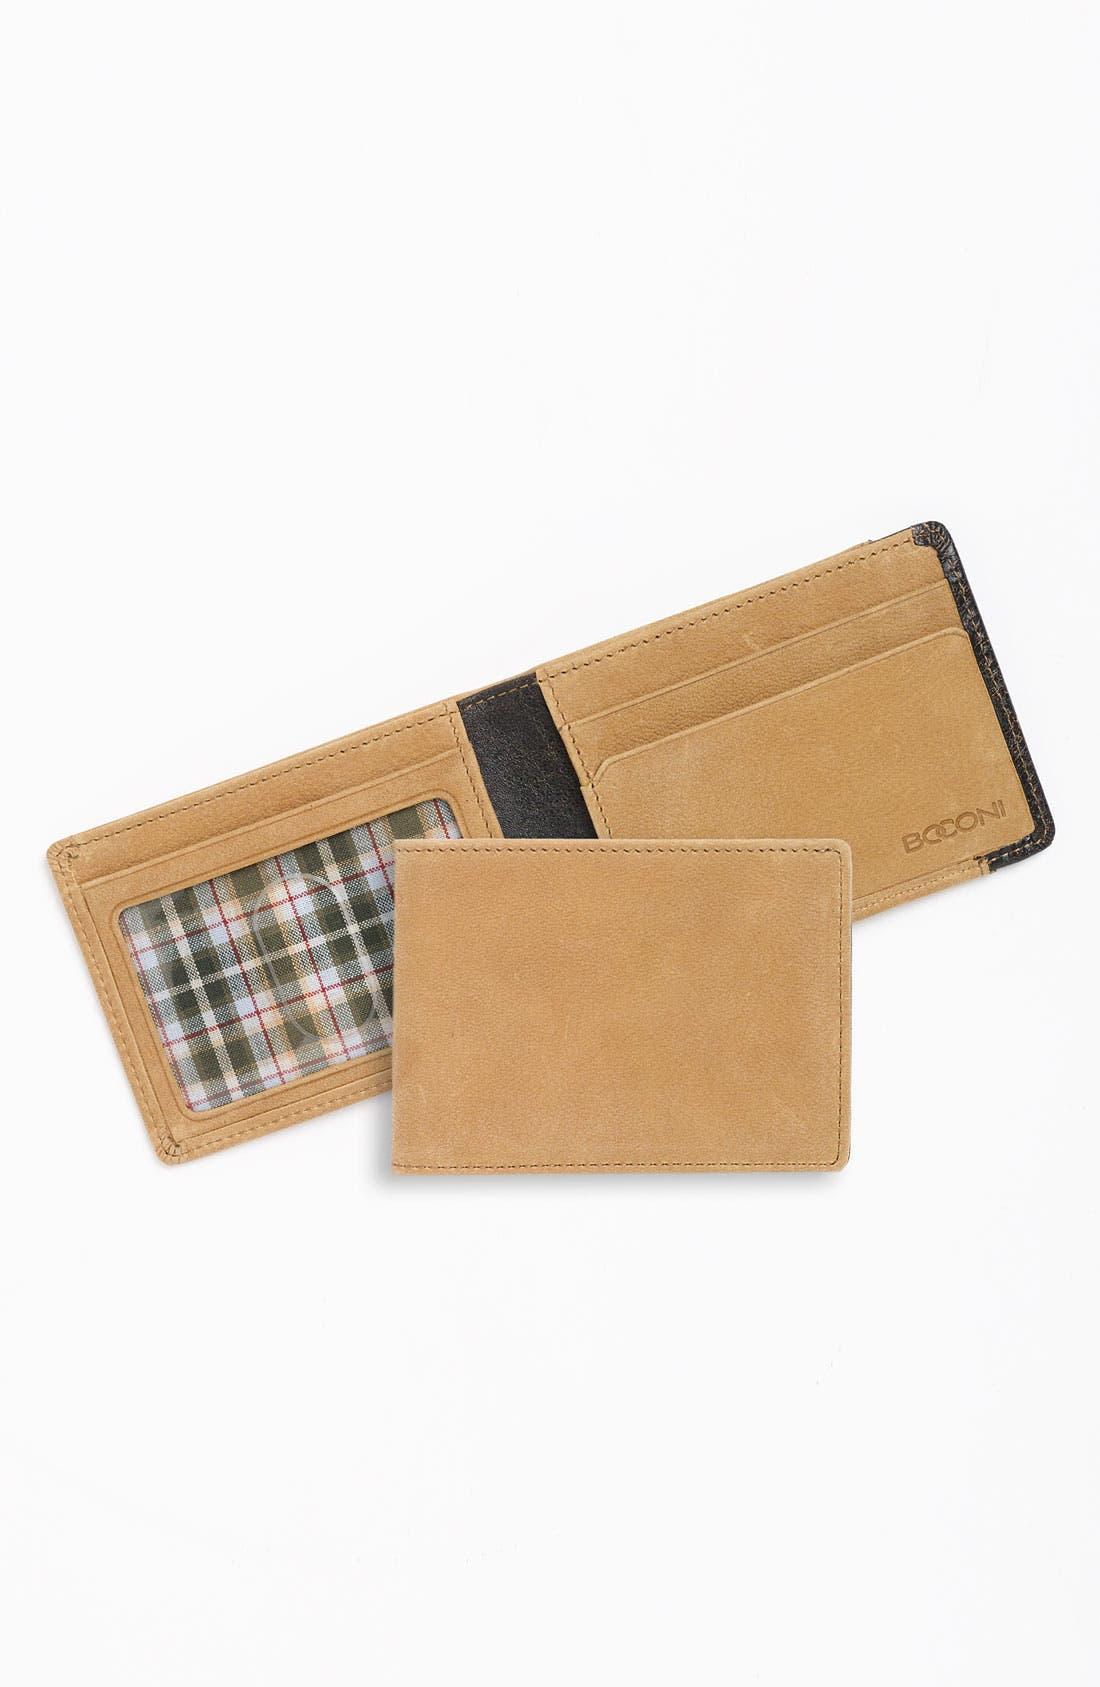 Main Image - Boconi 'Leon - Slimster' Leather Wallet